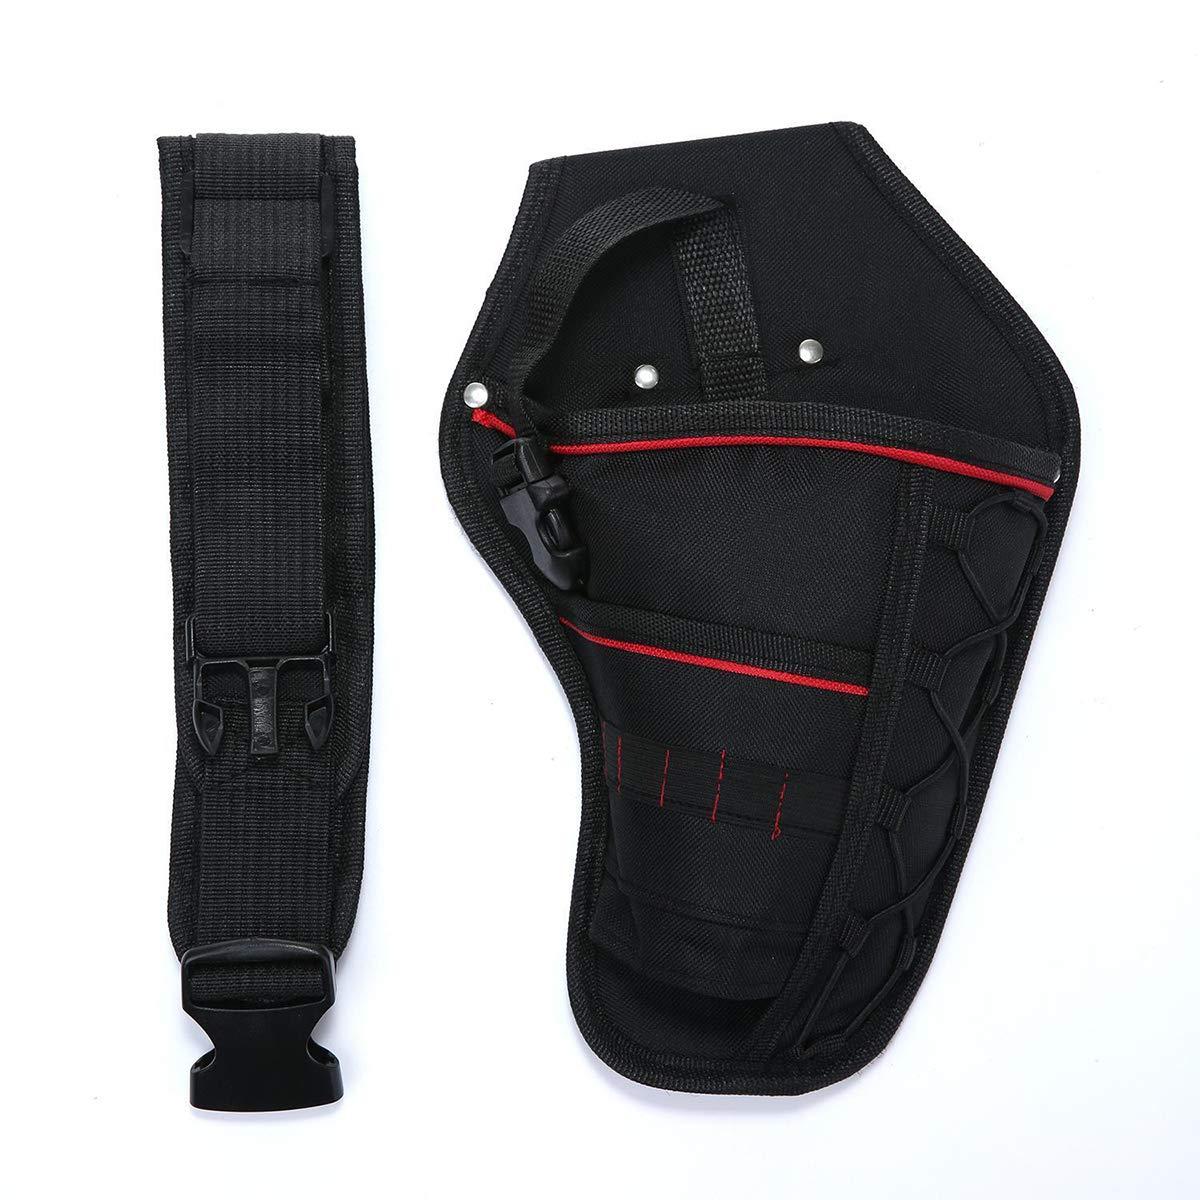 Electronic Storage Bag, Kisstaker Electrician Waist Pocket Tool Belt Pouch Bag Screwdriver Utility Kit Holder